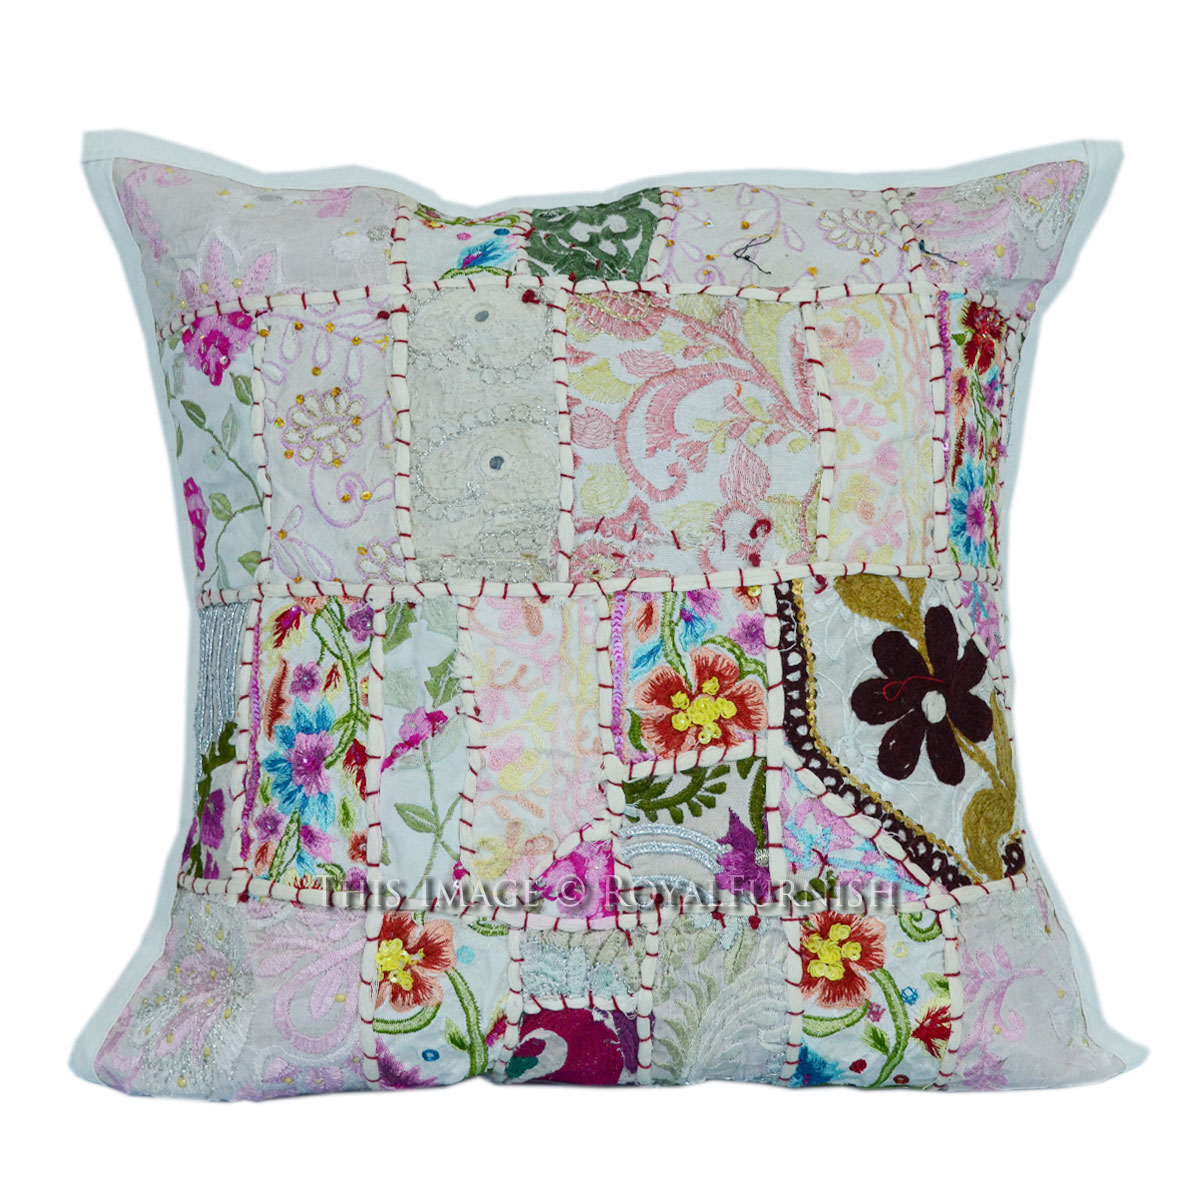 40x40 cm. Decorative White Sari Patchwork Throw Pillow Sham - RoyalFurnish.com